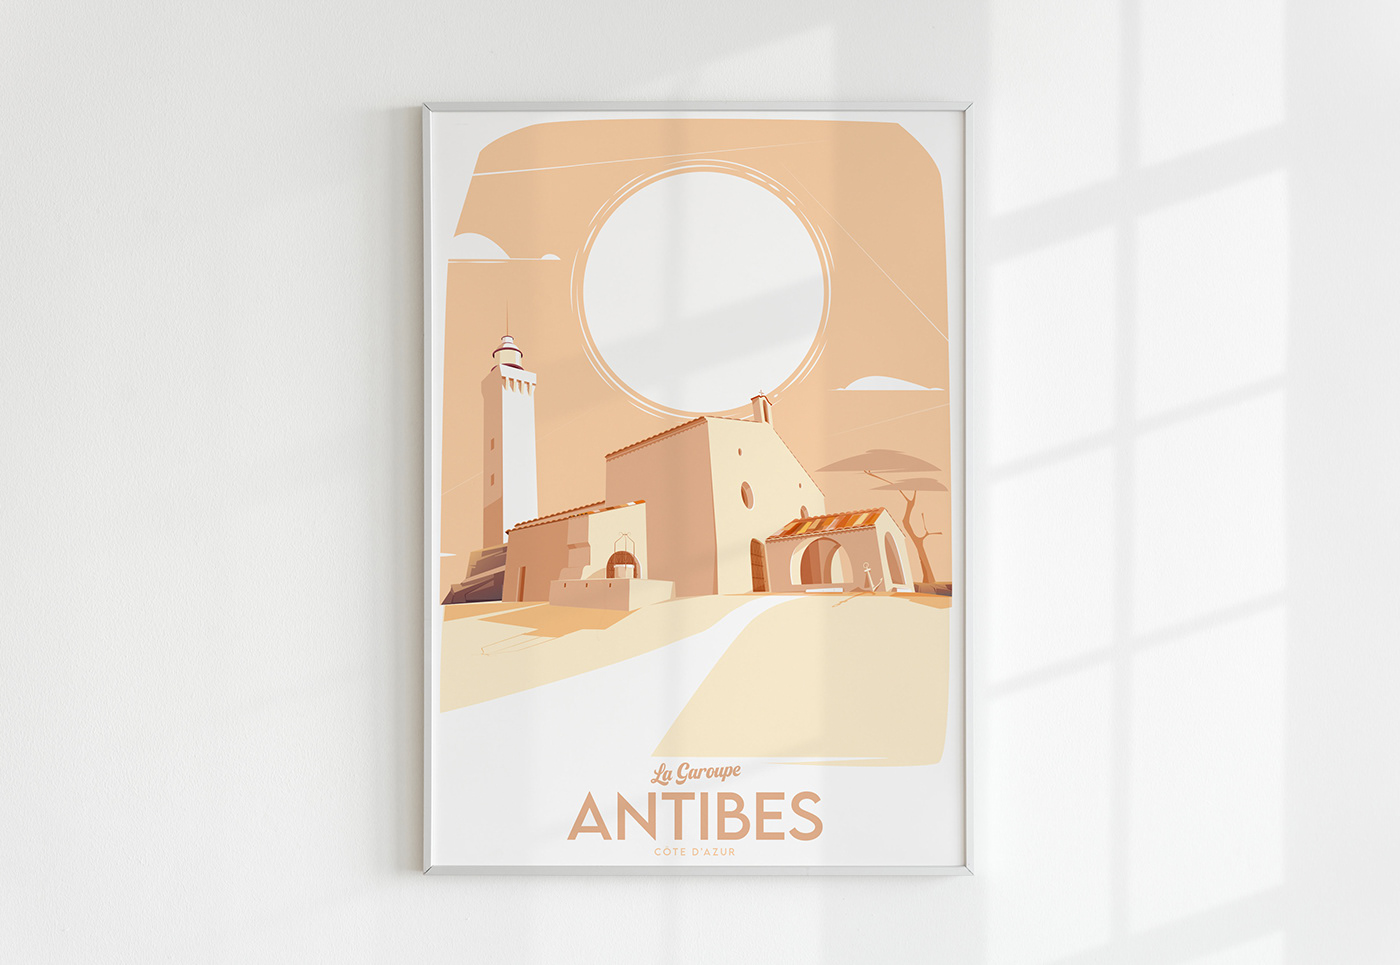 affiche Antibes affiche Nice cote d'azur ILLUSTRATION  lecoupdulapin nissarde.com phare de la garoupe poster